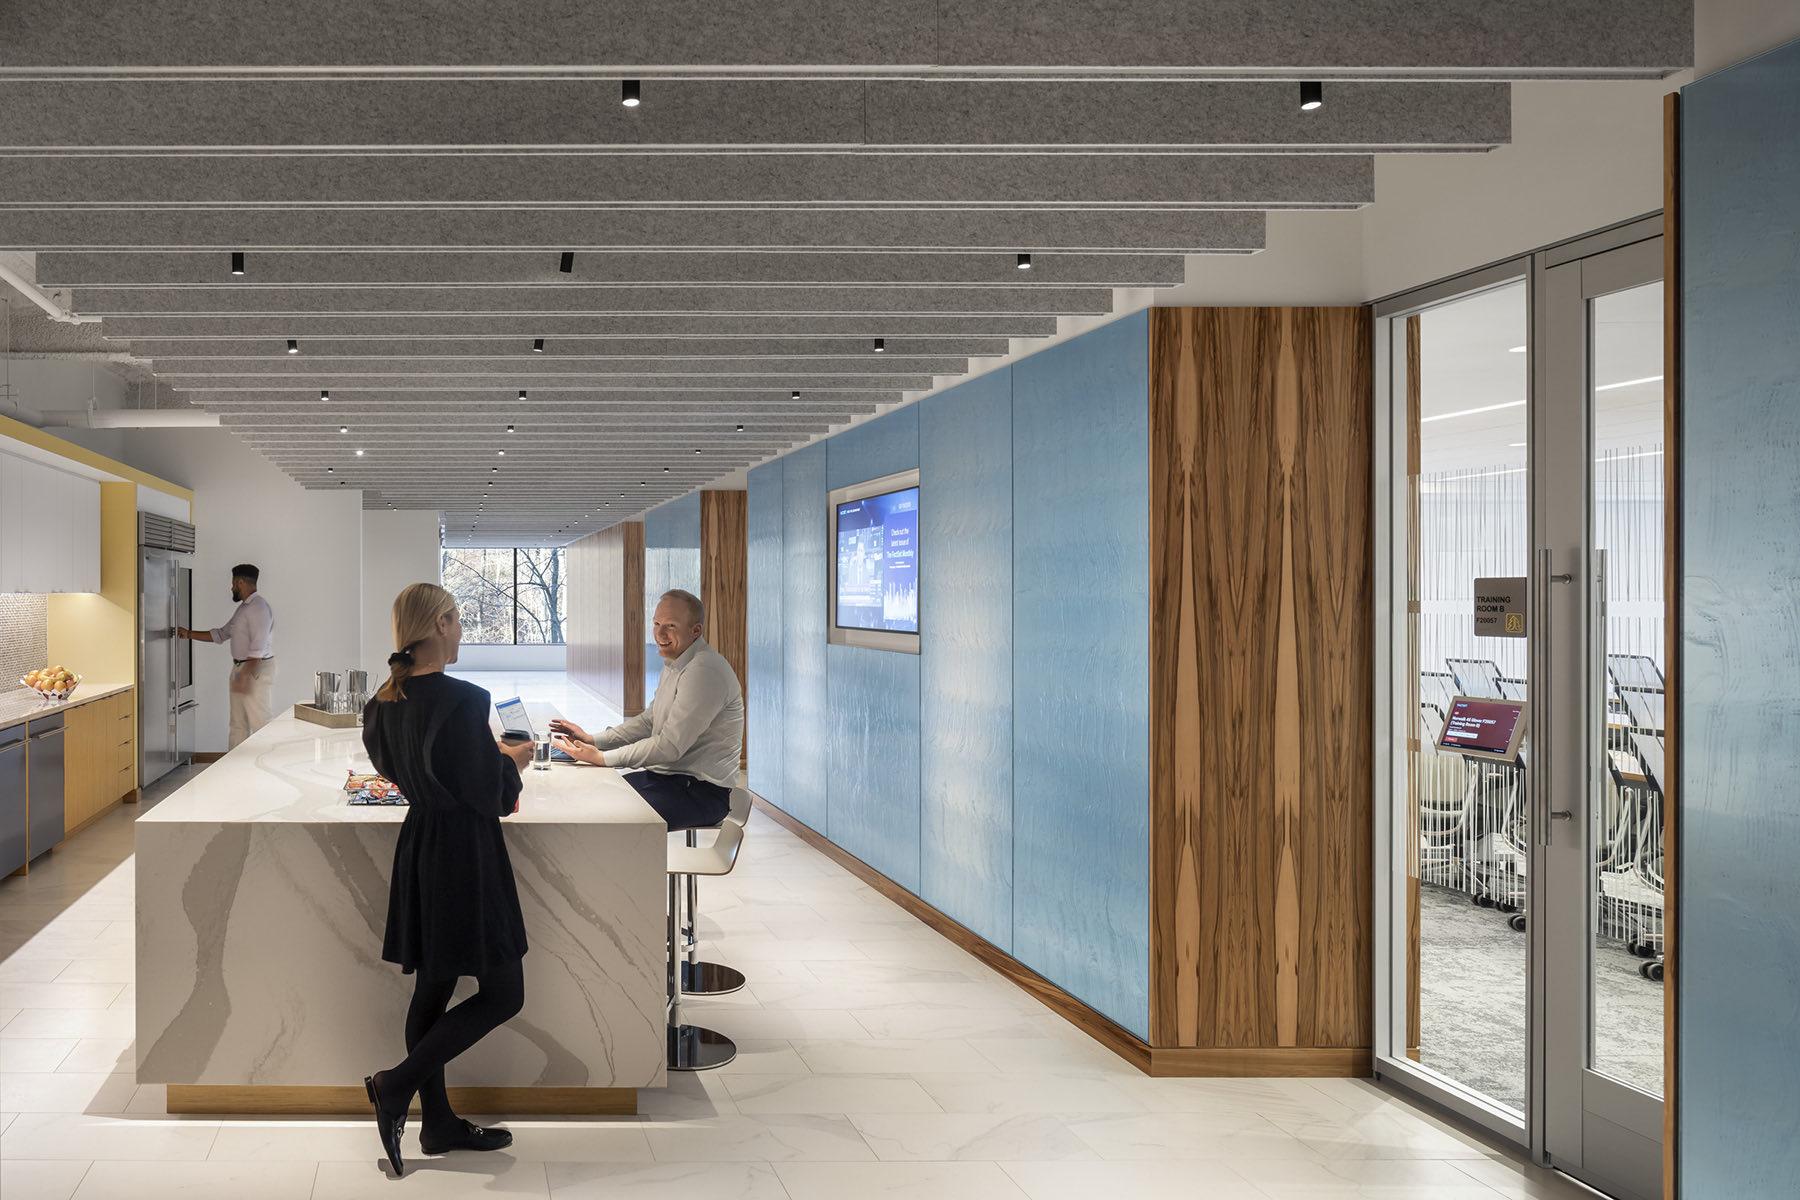 factset-norwalk-office-9